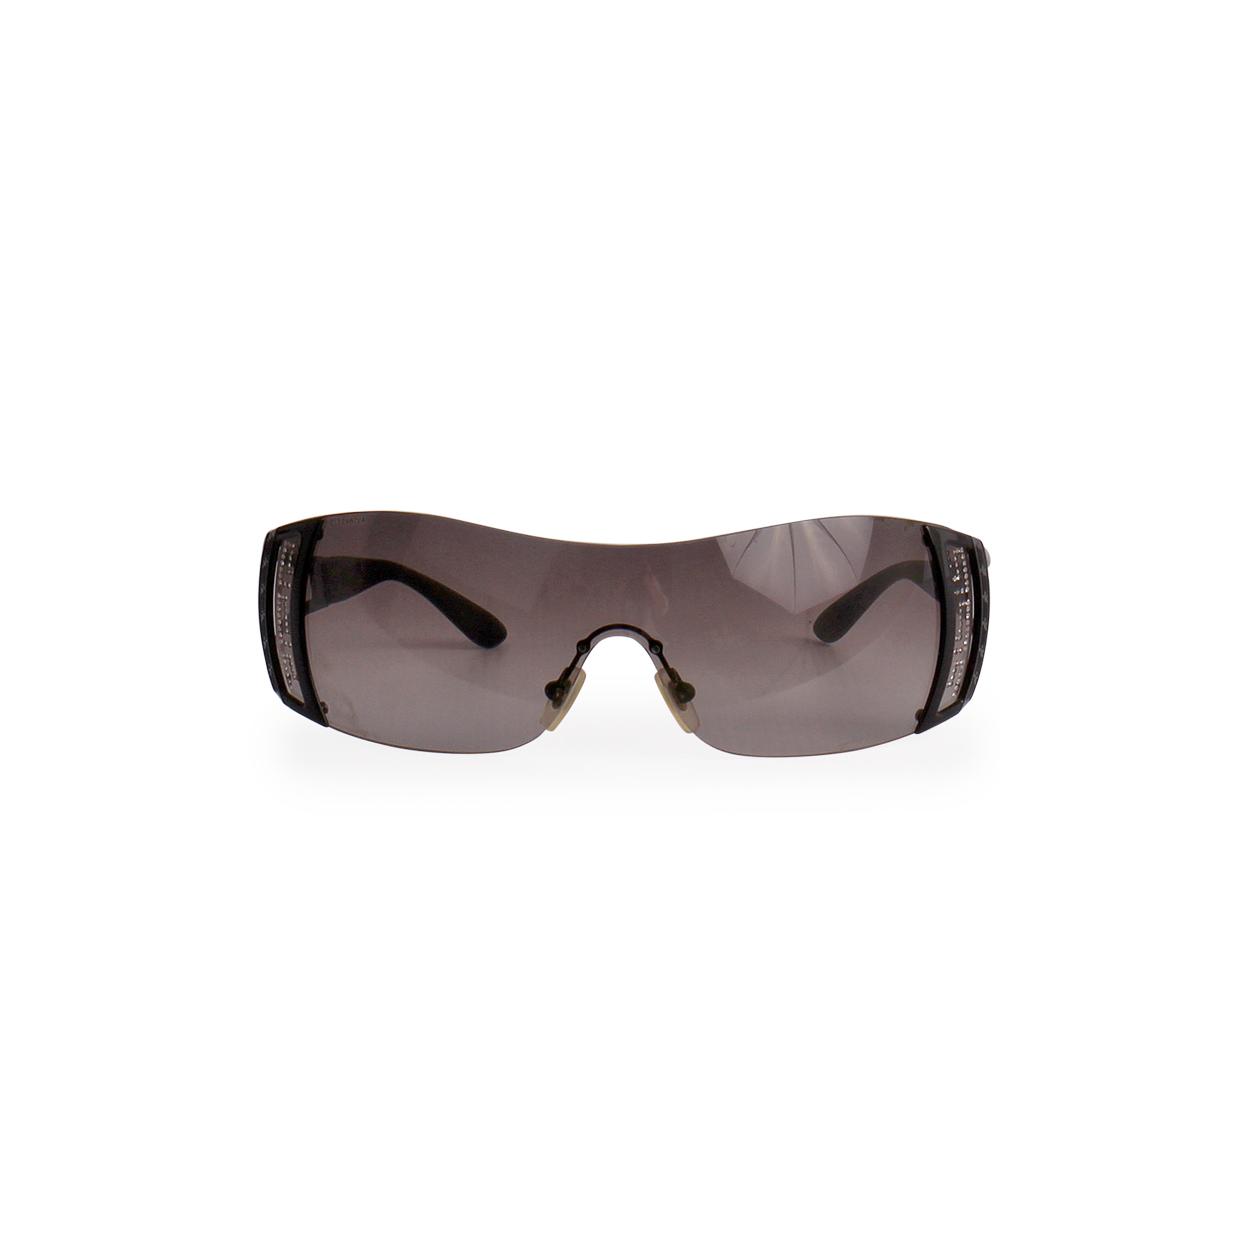 8b4ff4b74e87 VERSACE Crystals Sunglasses 2058 B Black - front